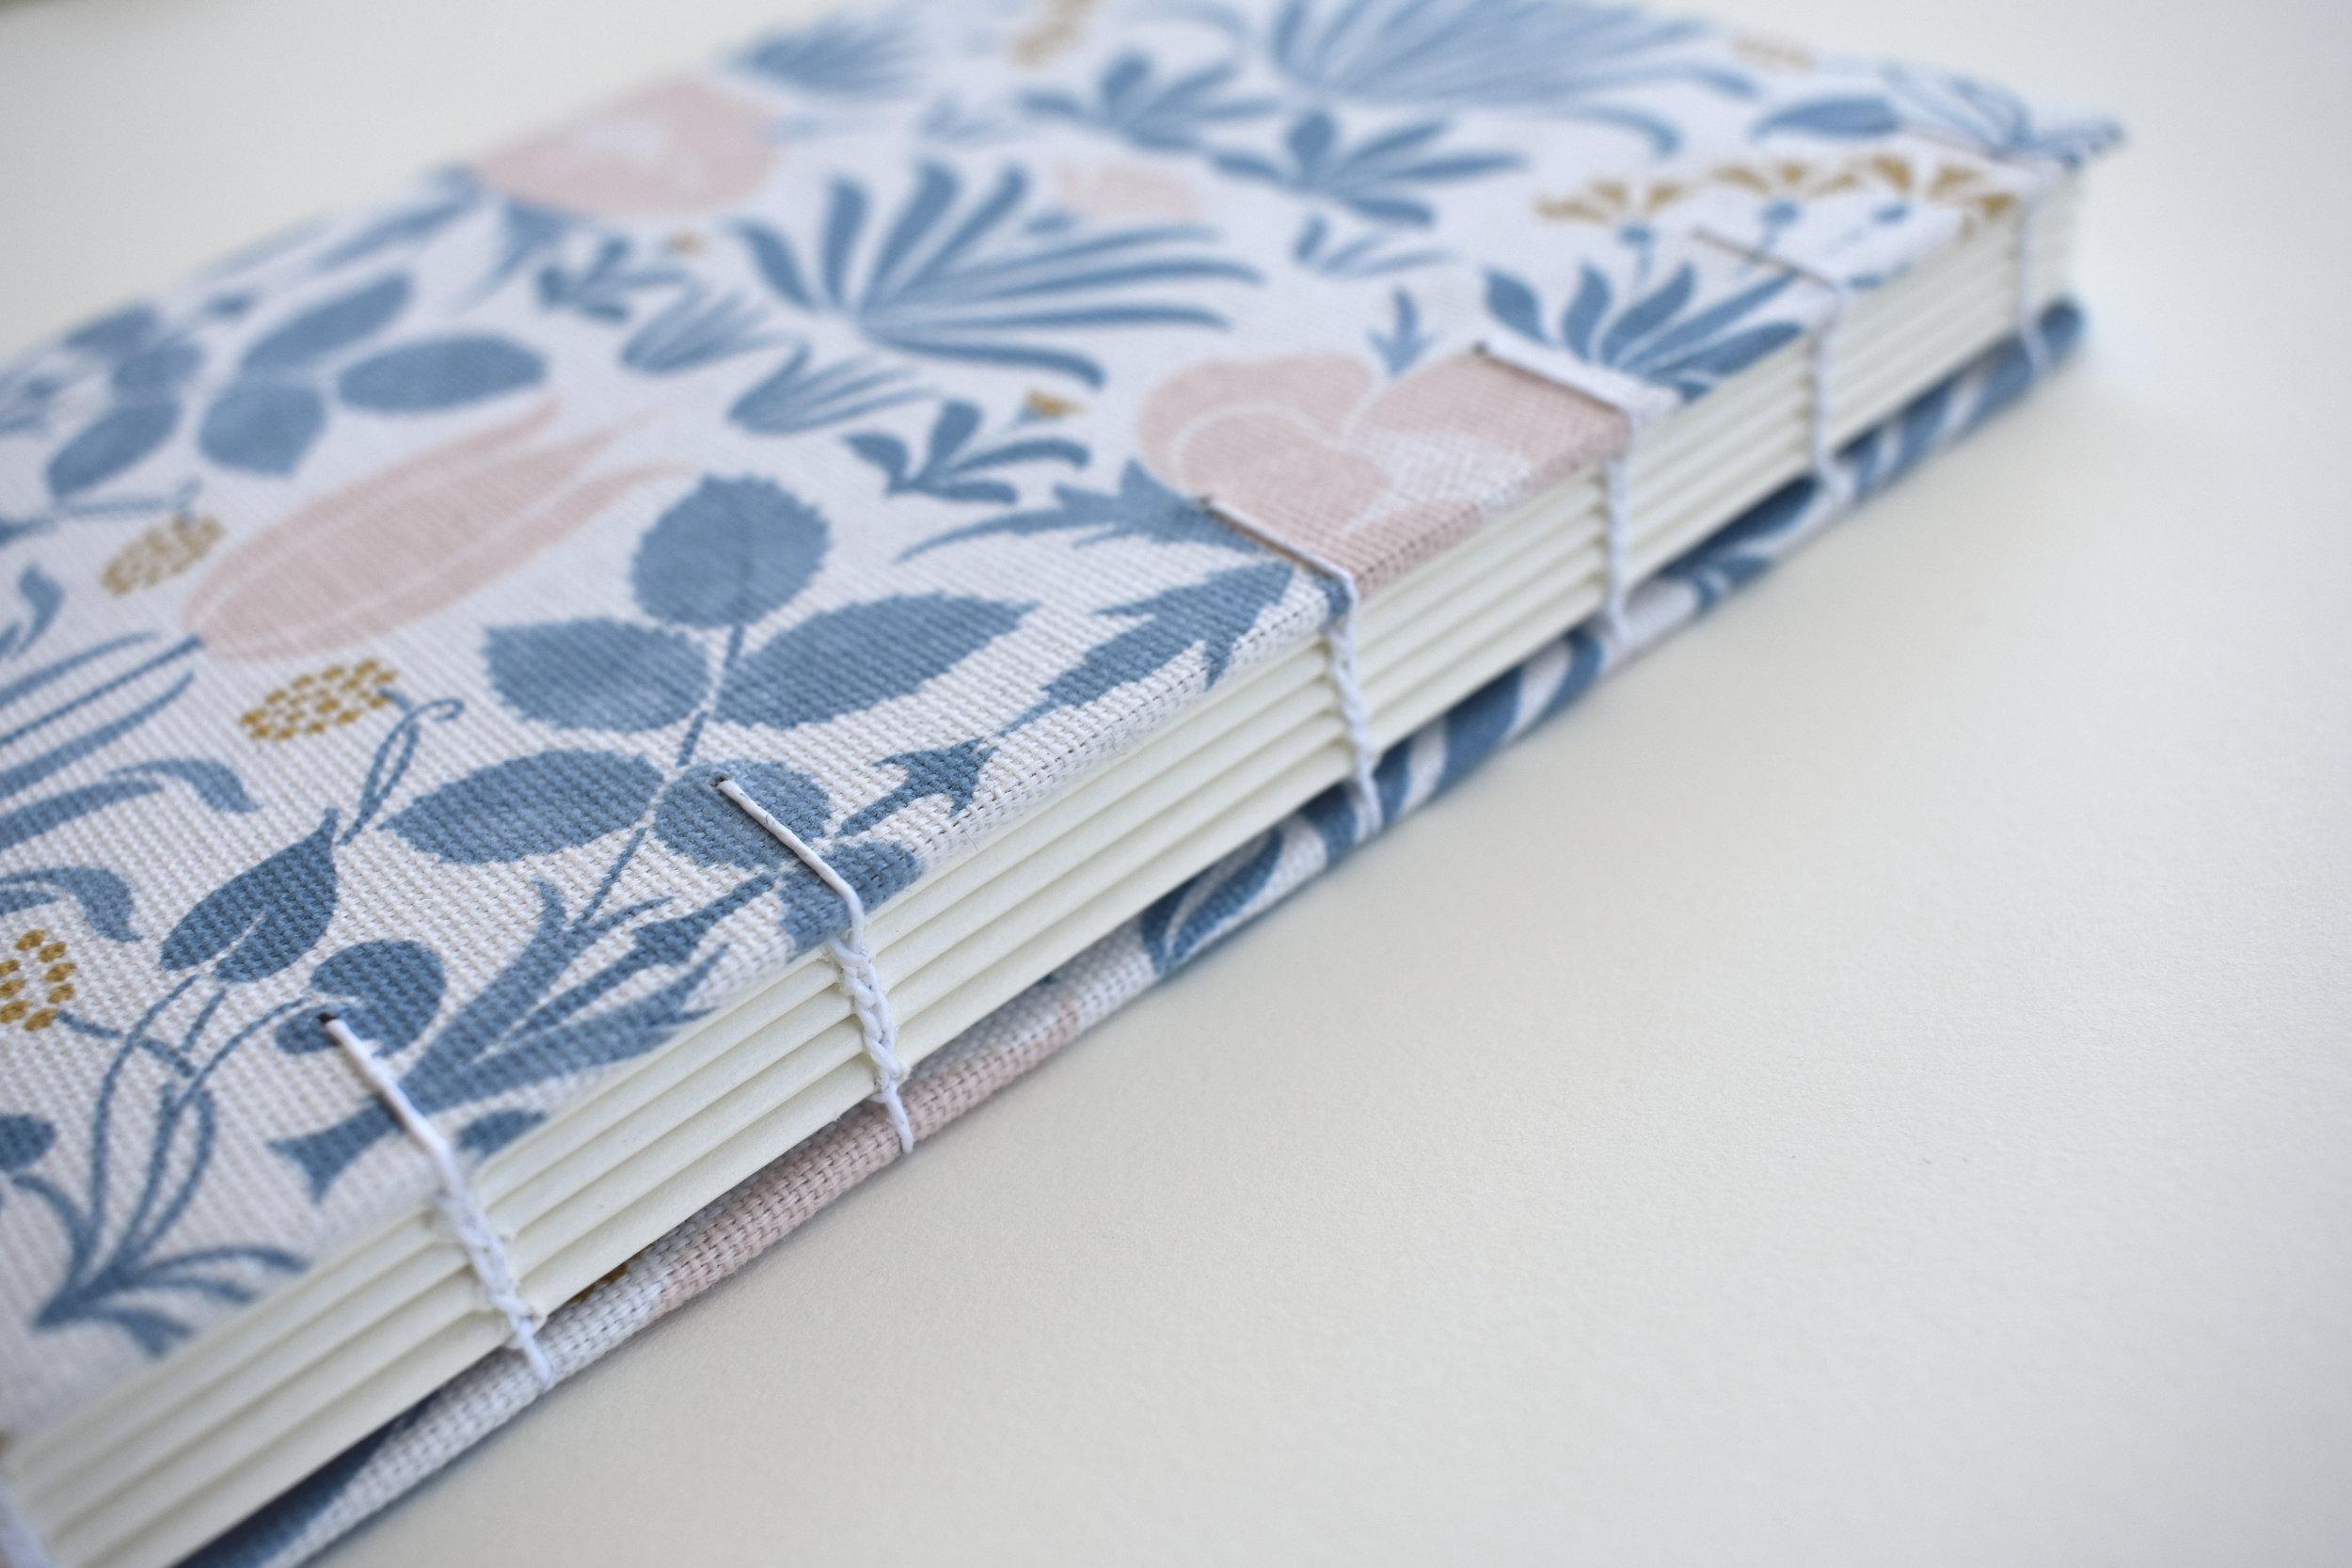 London Cloth book, 2019